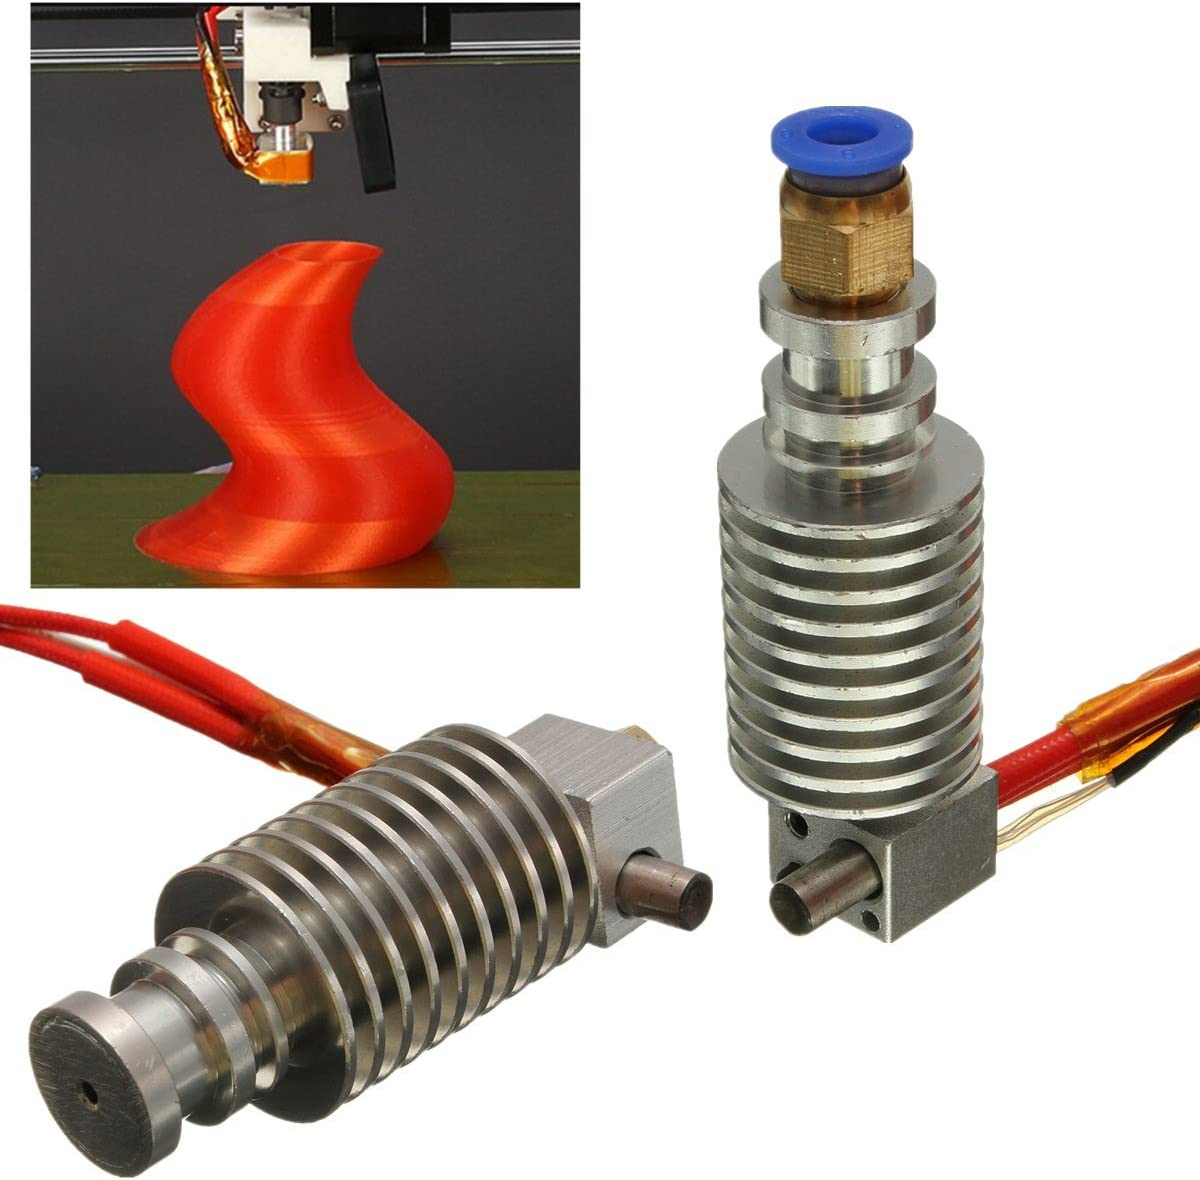 MYAMIA 1.75Mm / 3Mm J-Head Hotend Extruder para Impresora 3D ...